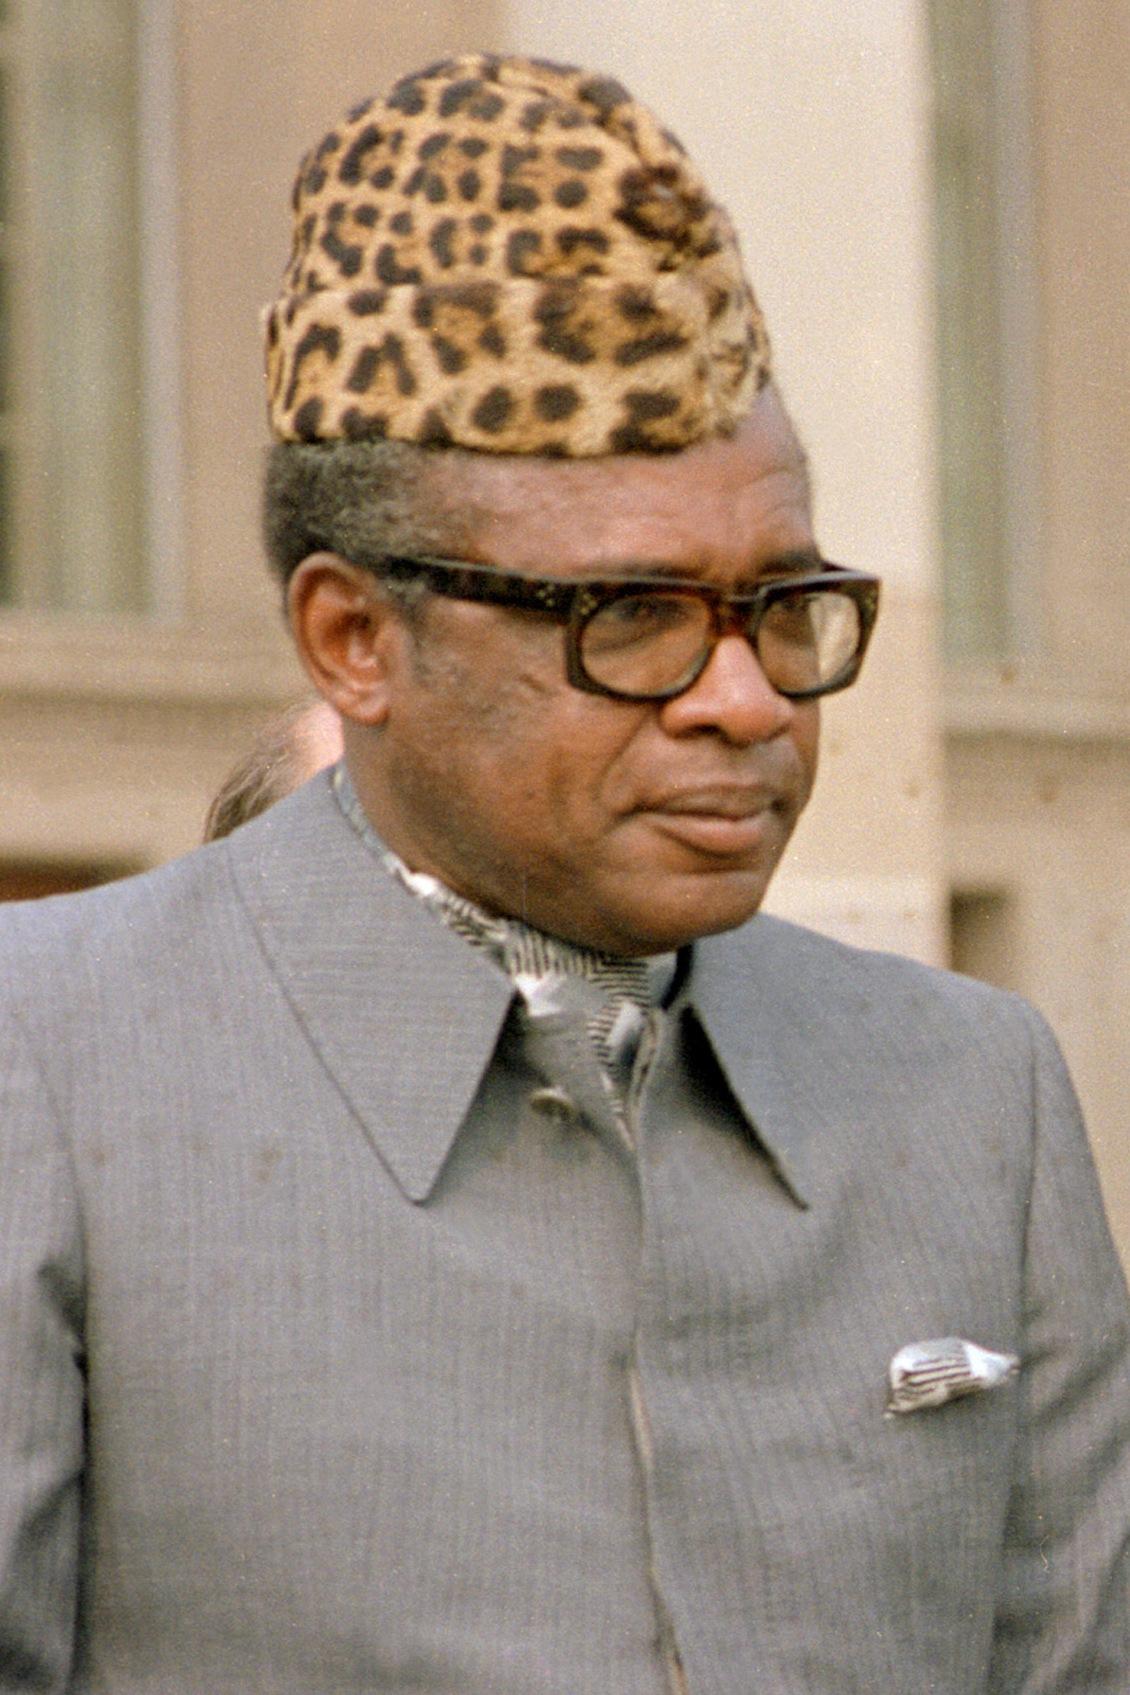 ACCUSED DICTATOR MOBUTU: Former DRC (Zaire) President Mobutu Sese Seko